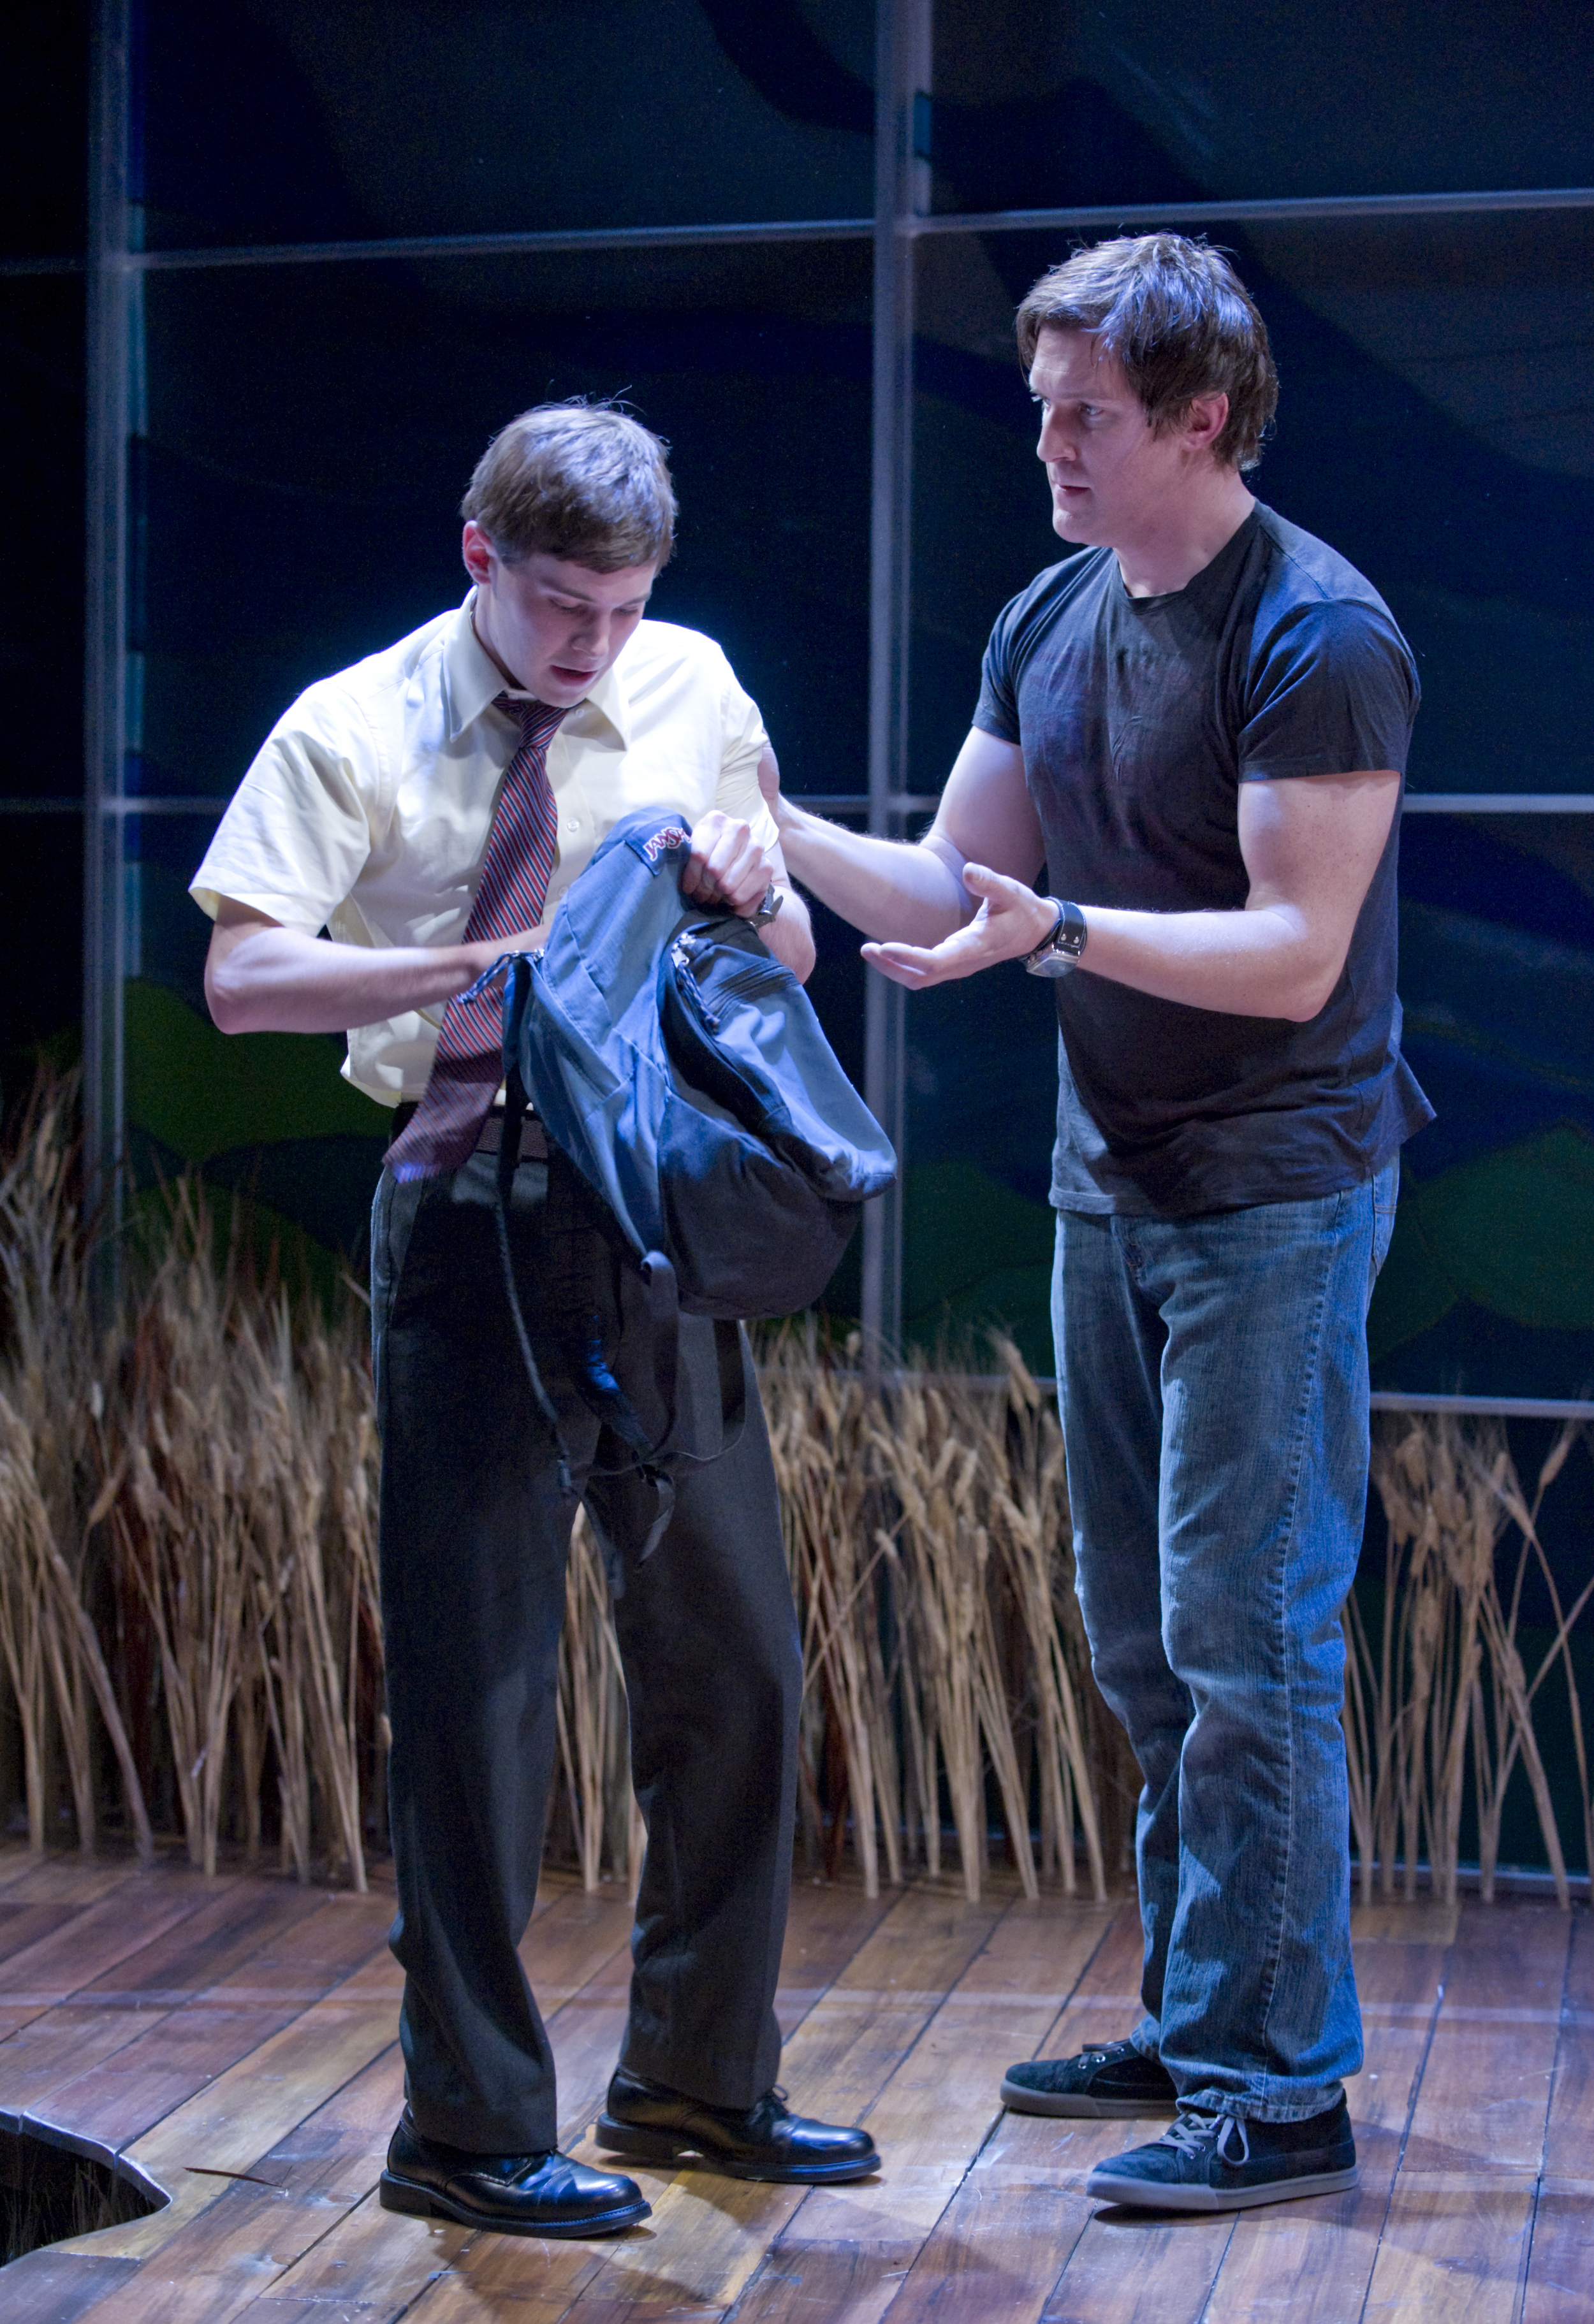 Aaron and Ian, backpack - vert (2927).jpg